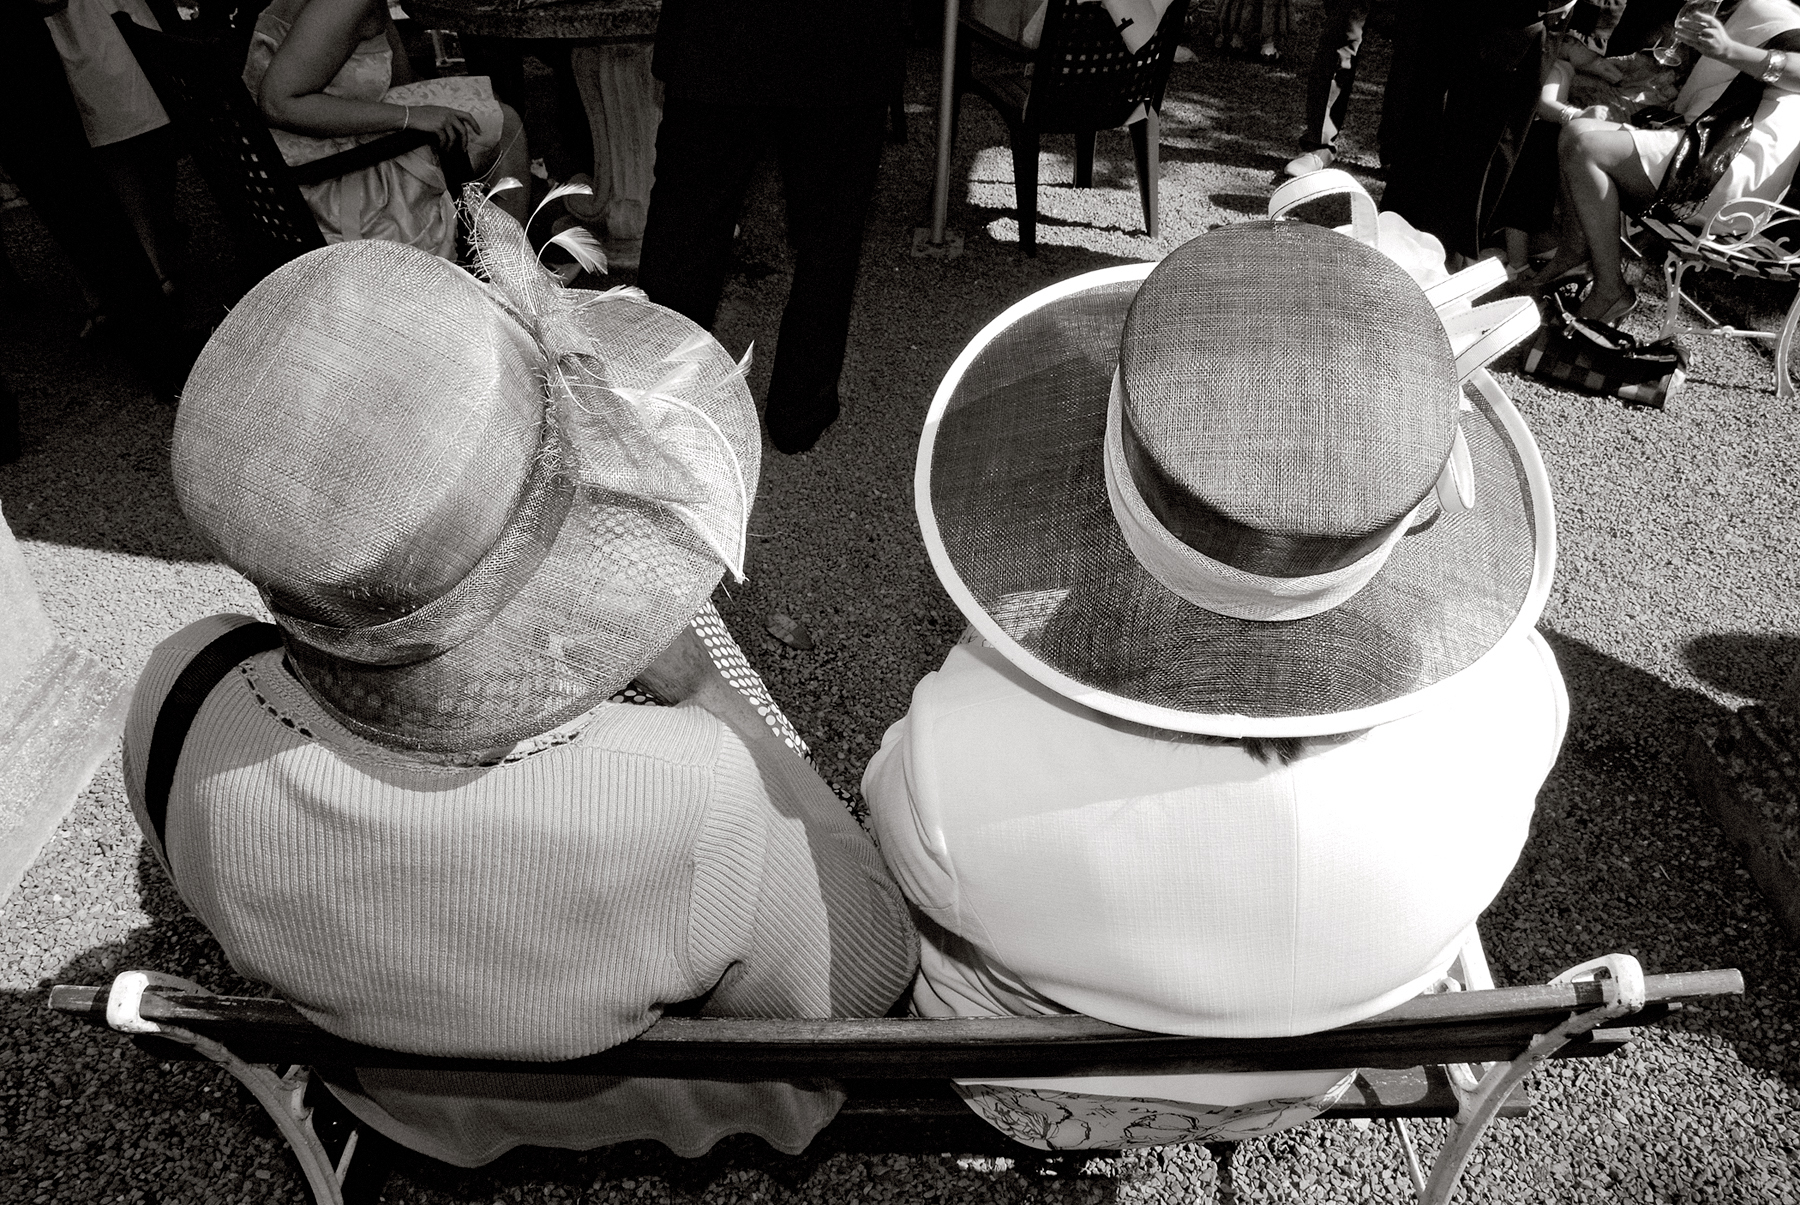 Two ladies wearing hats, wedding